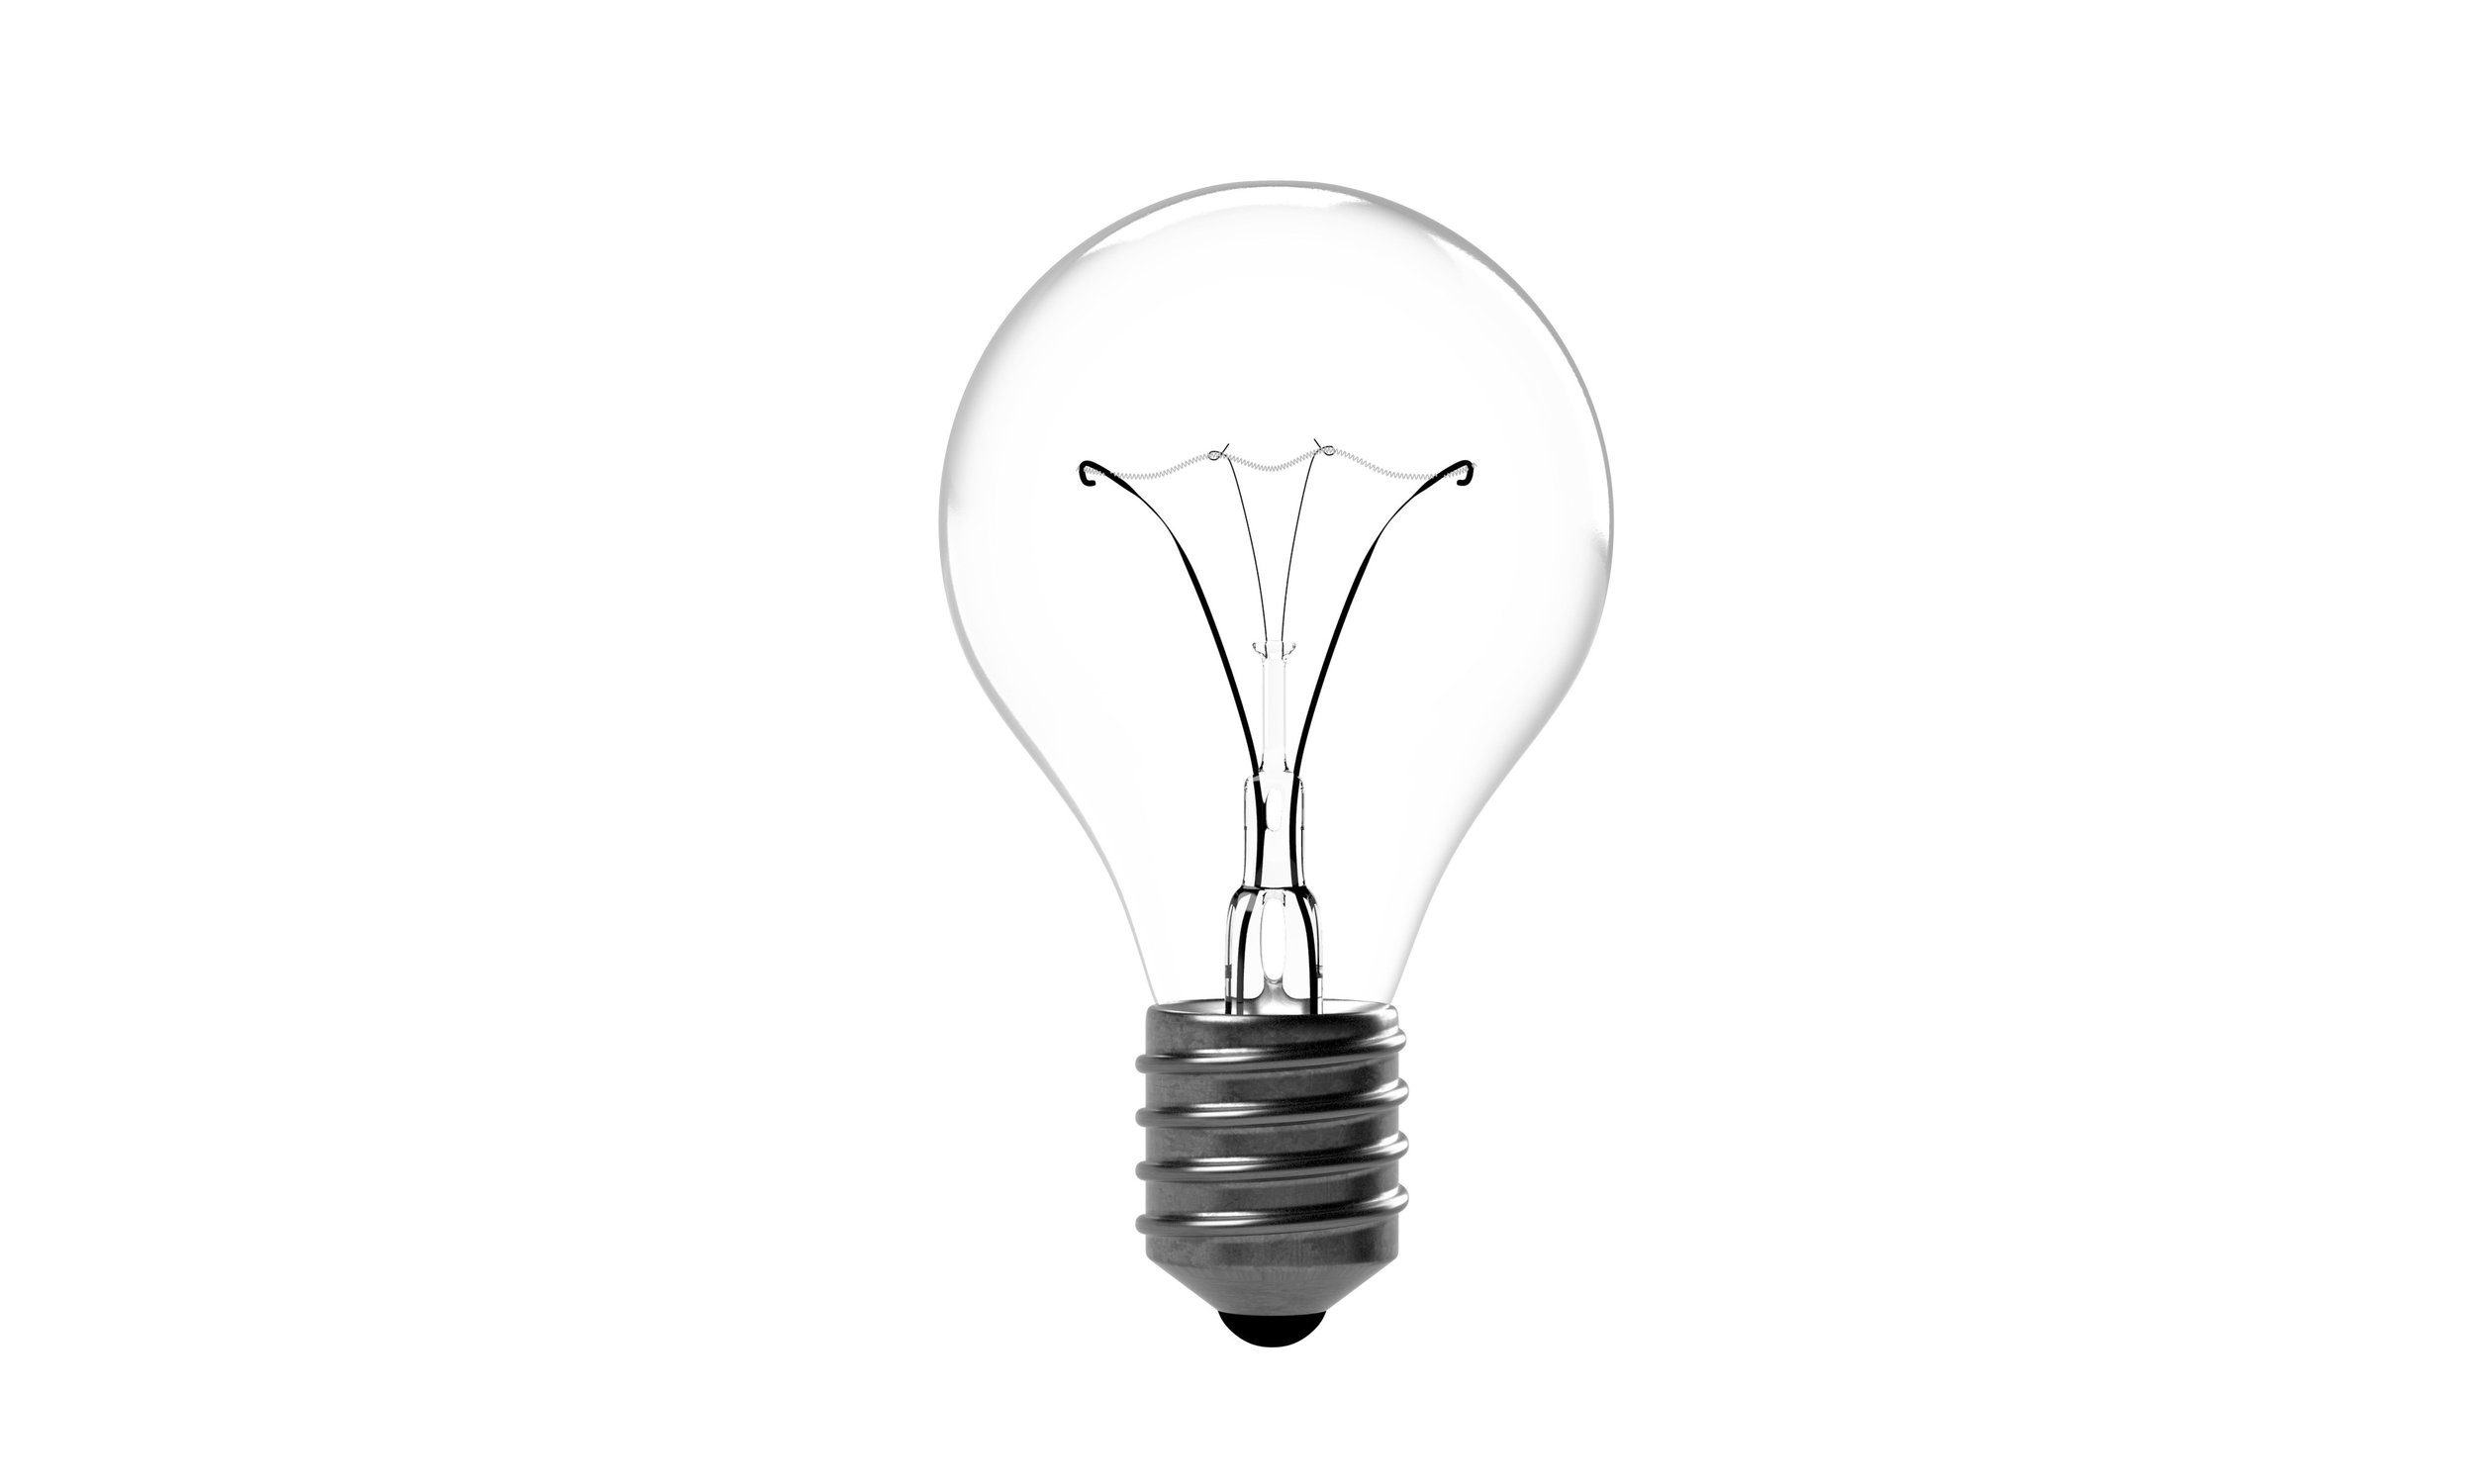 bright-energy-idea-247753.jpg